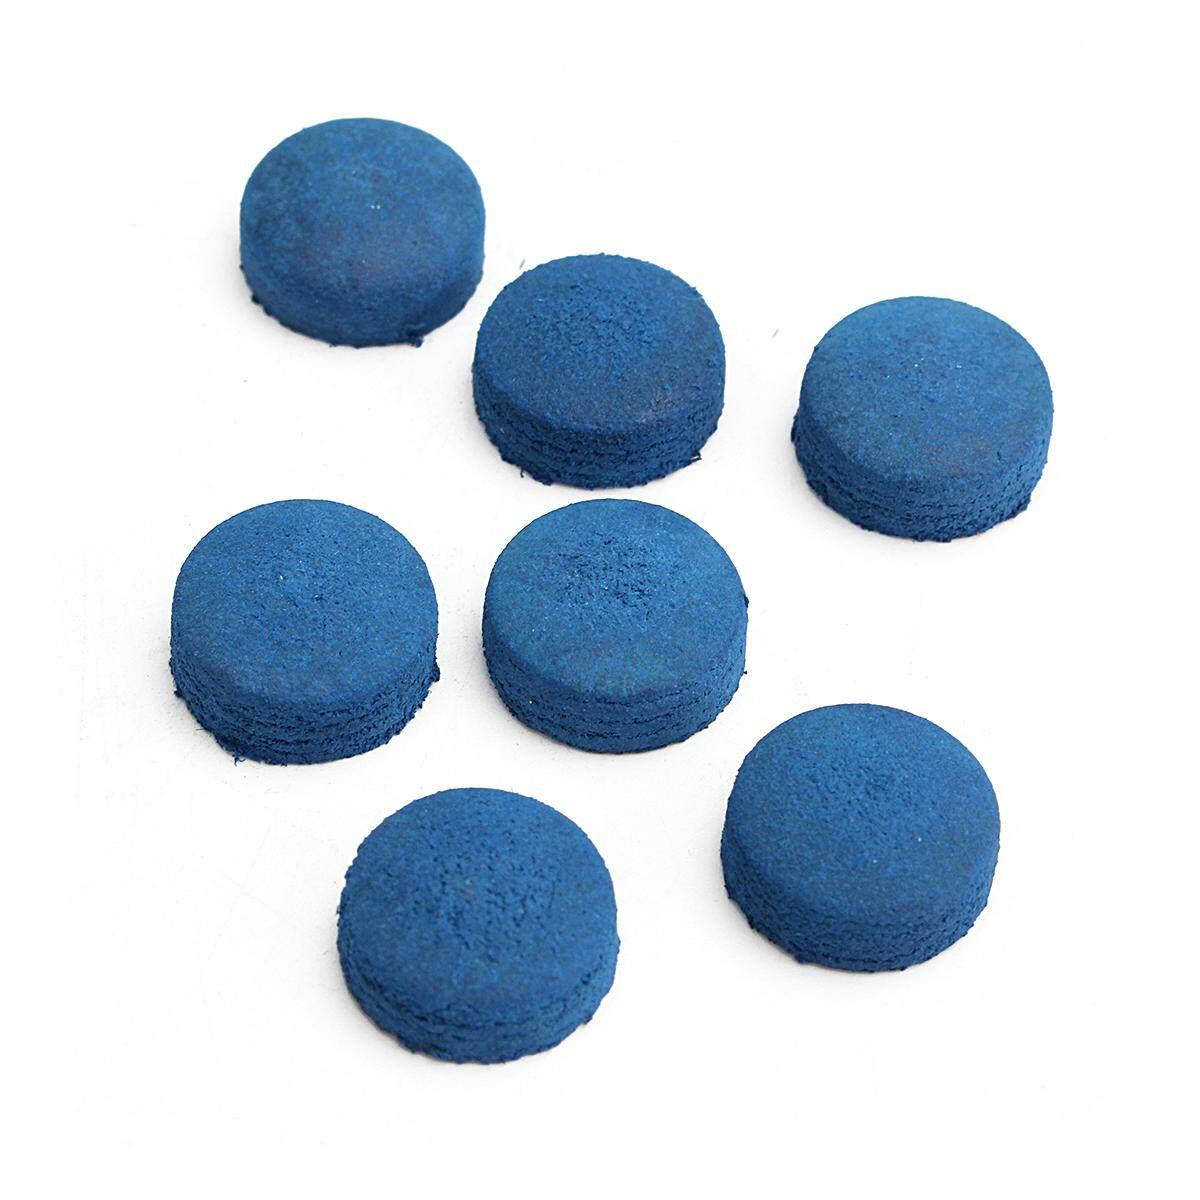 Hình ảnh 50 Pcs Glue-on Pool Billiards Leather Blue Cue Tips Box Game Sport # 9mm